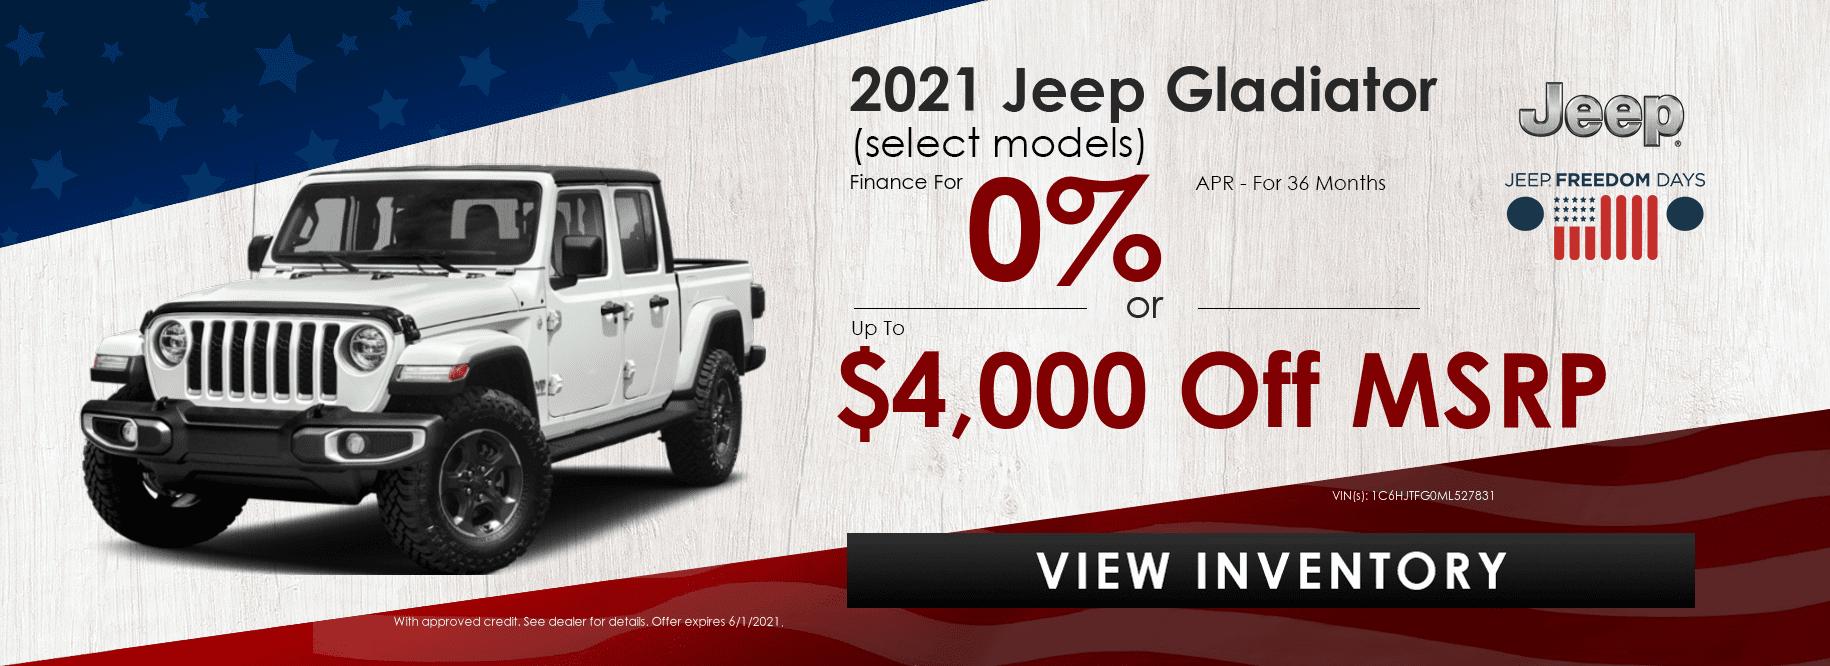 2021-Jeep-Gladiator-(select-models)-41